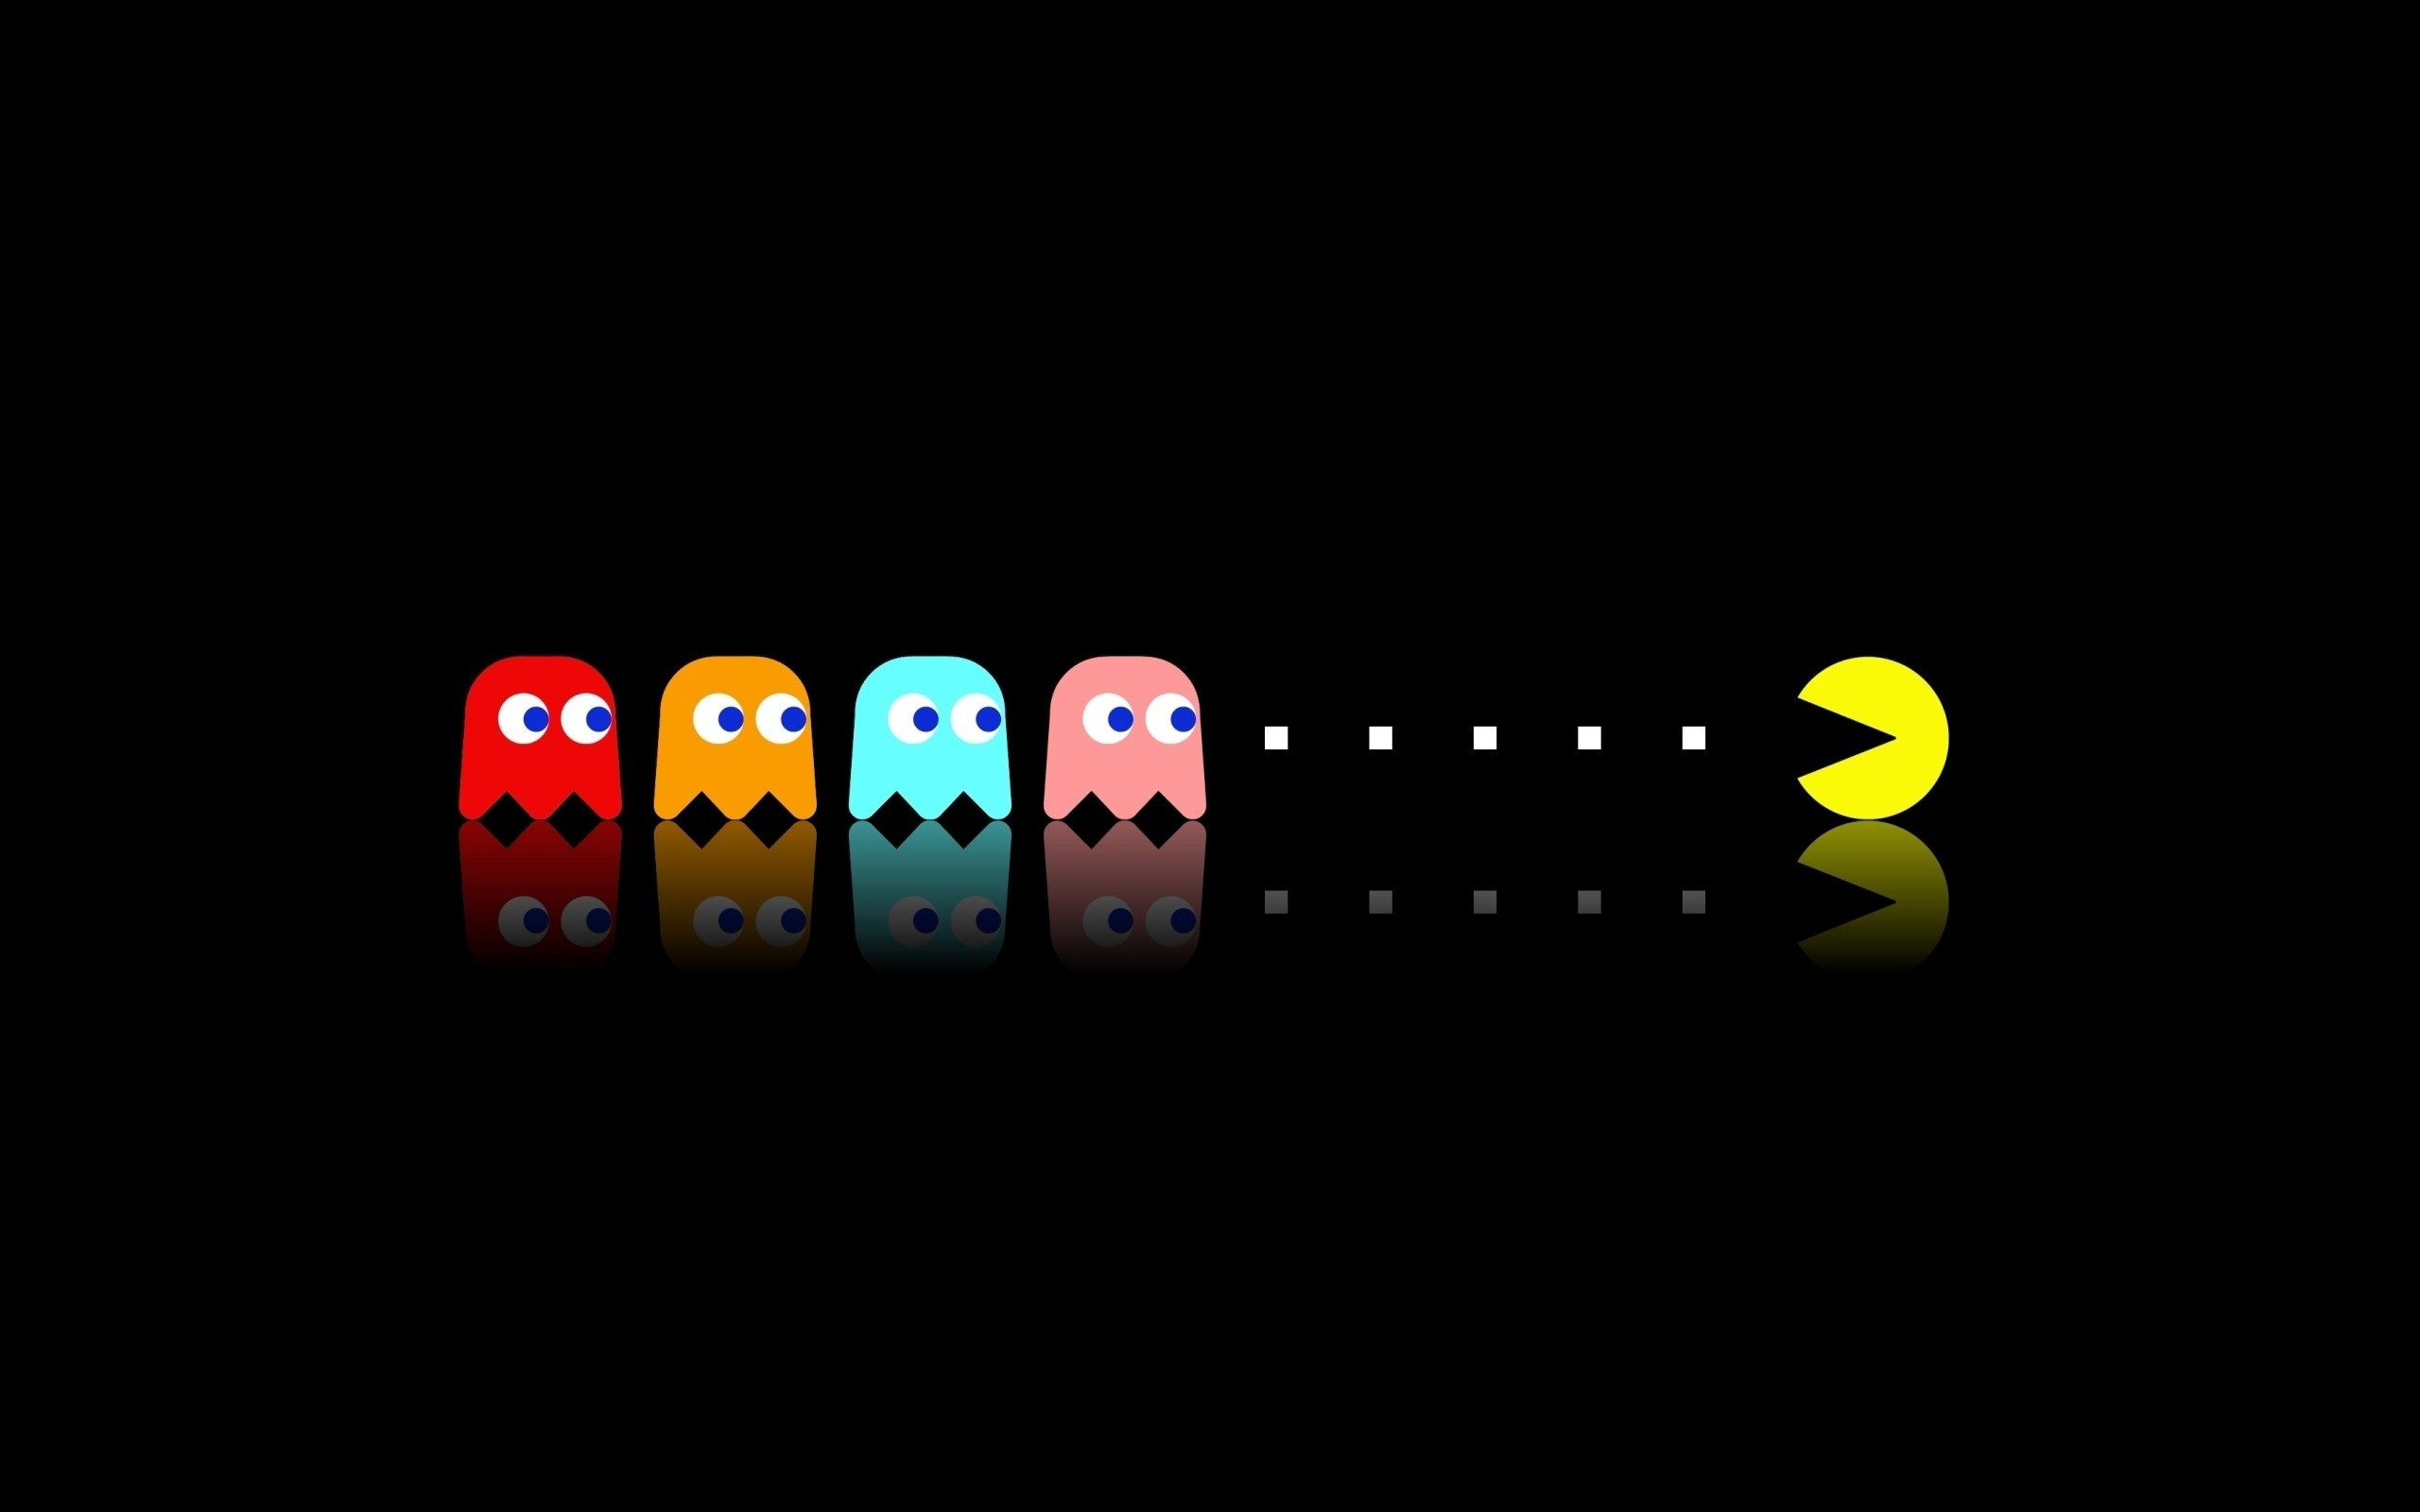 3d Animated Snake Live Wallpaper Wallpaper 2560x1600 Px Minimalism Pac Man Retro Games